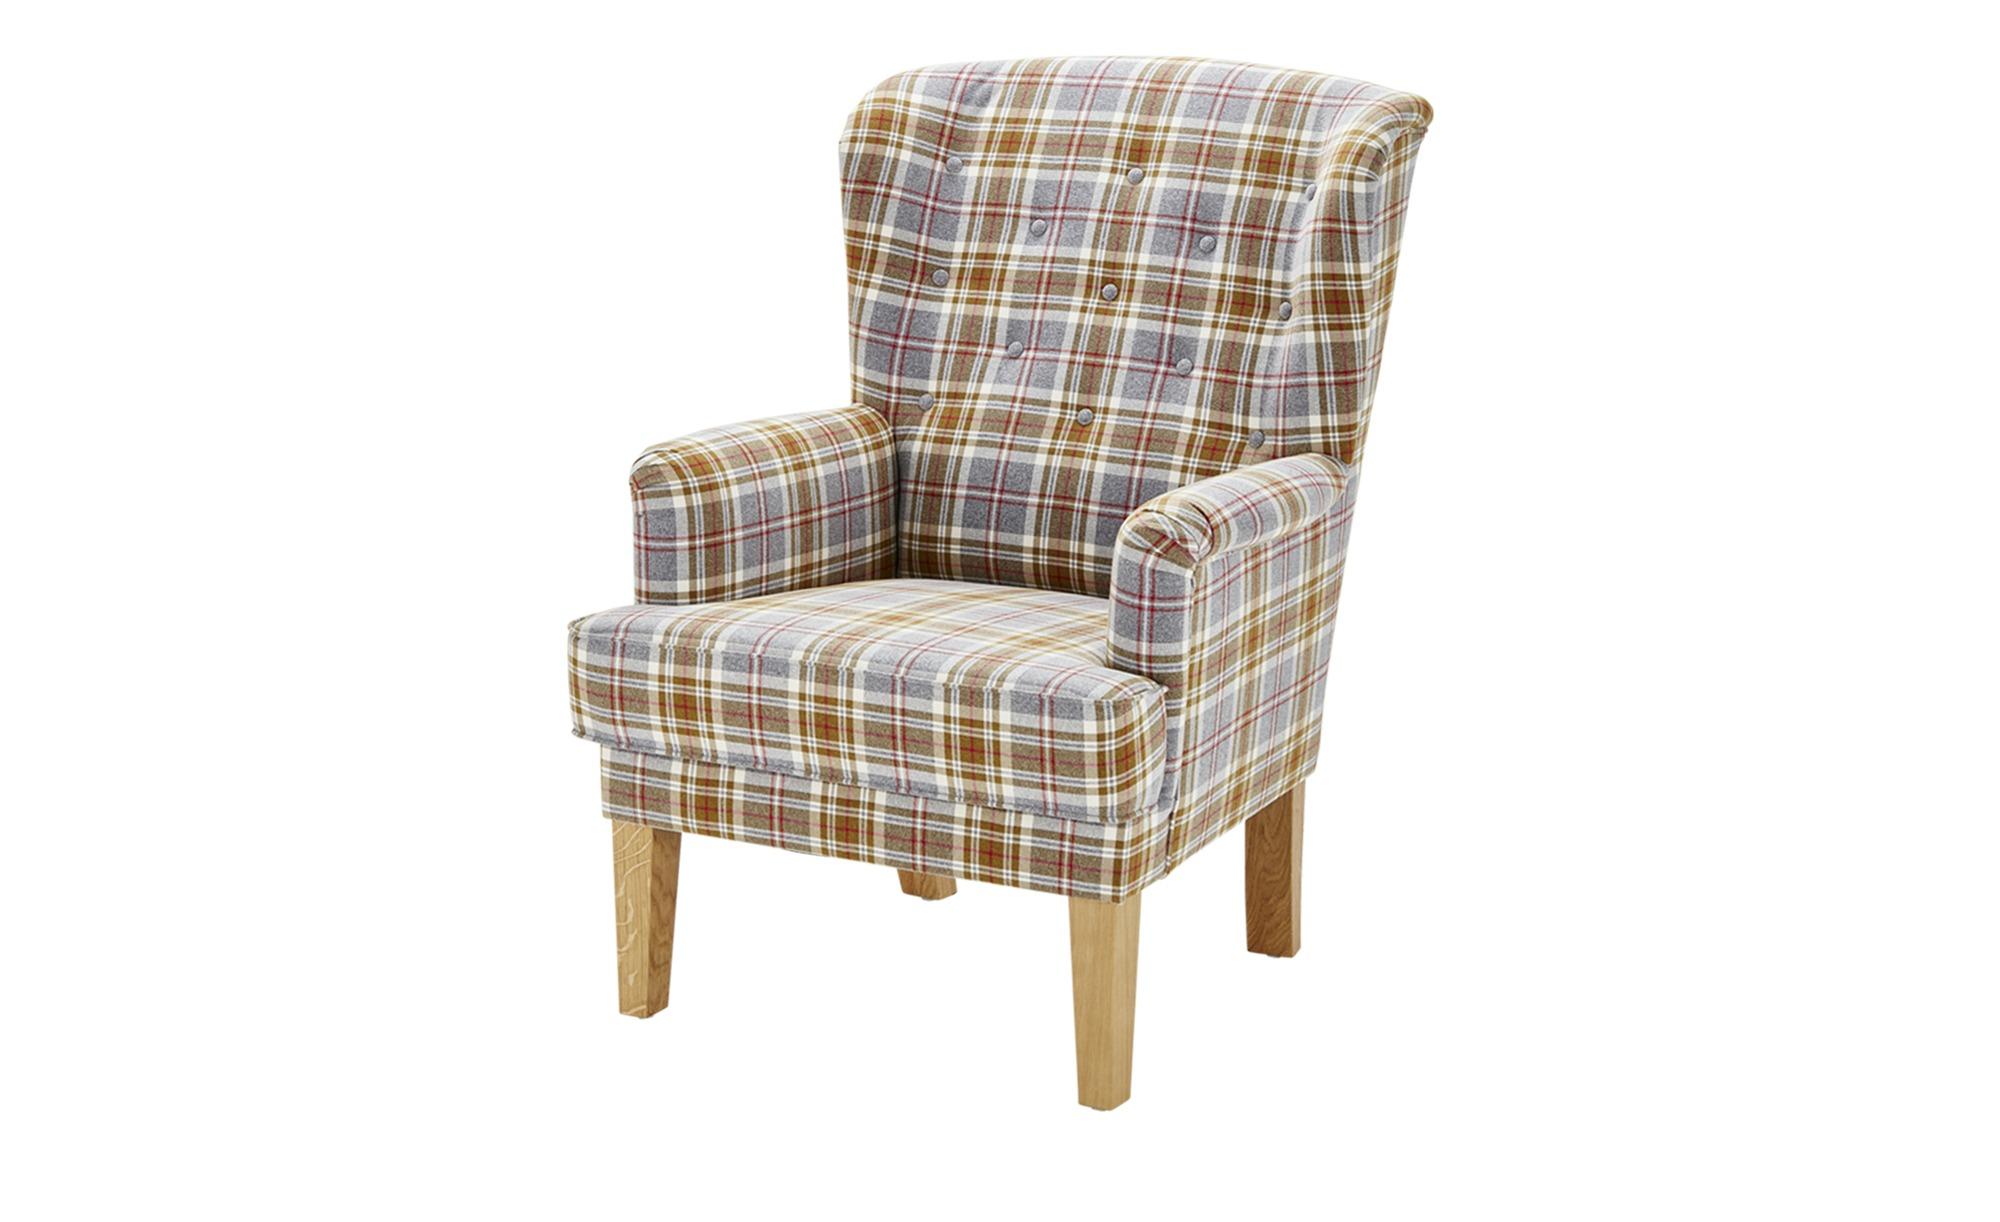 Sessel kariert - Stoff Reith ¦ mehrfarbig ¦ Maße (cm): B: 74 H: 105 T: 87 Polstermöbel > Sessel > Ohrensessel - Höffner